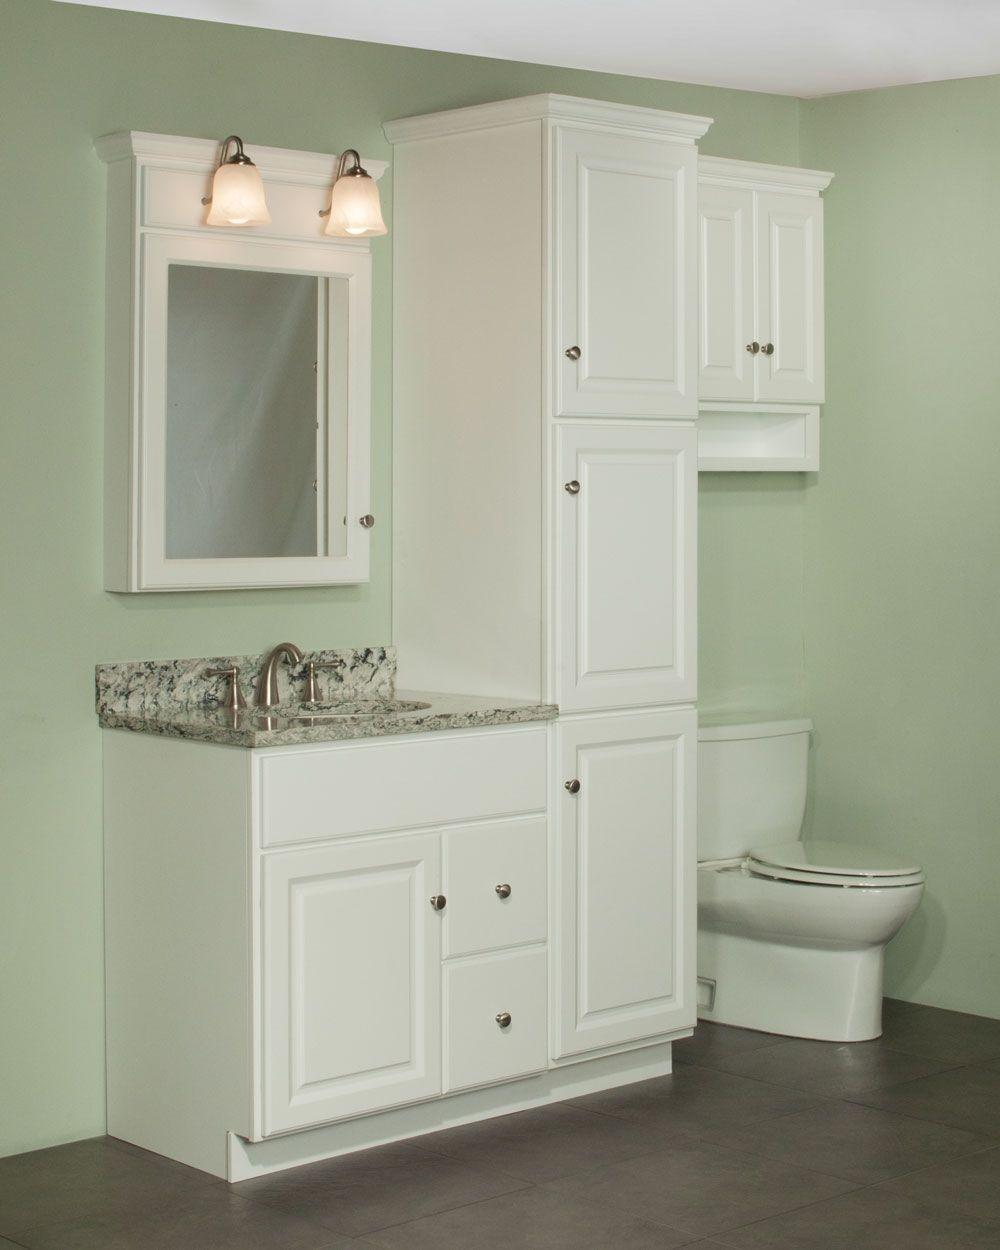 Miraculous Bathroom Vanities With Matching Linen Cabinets Of Home regarding proportions 1000 X 1250